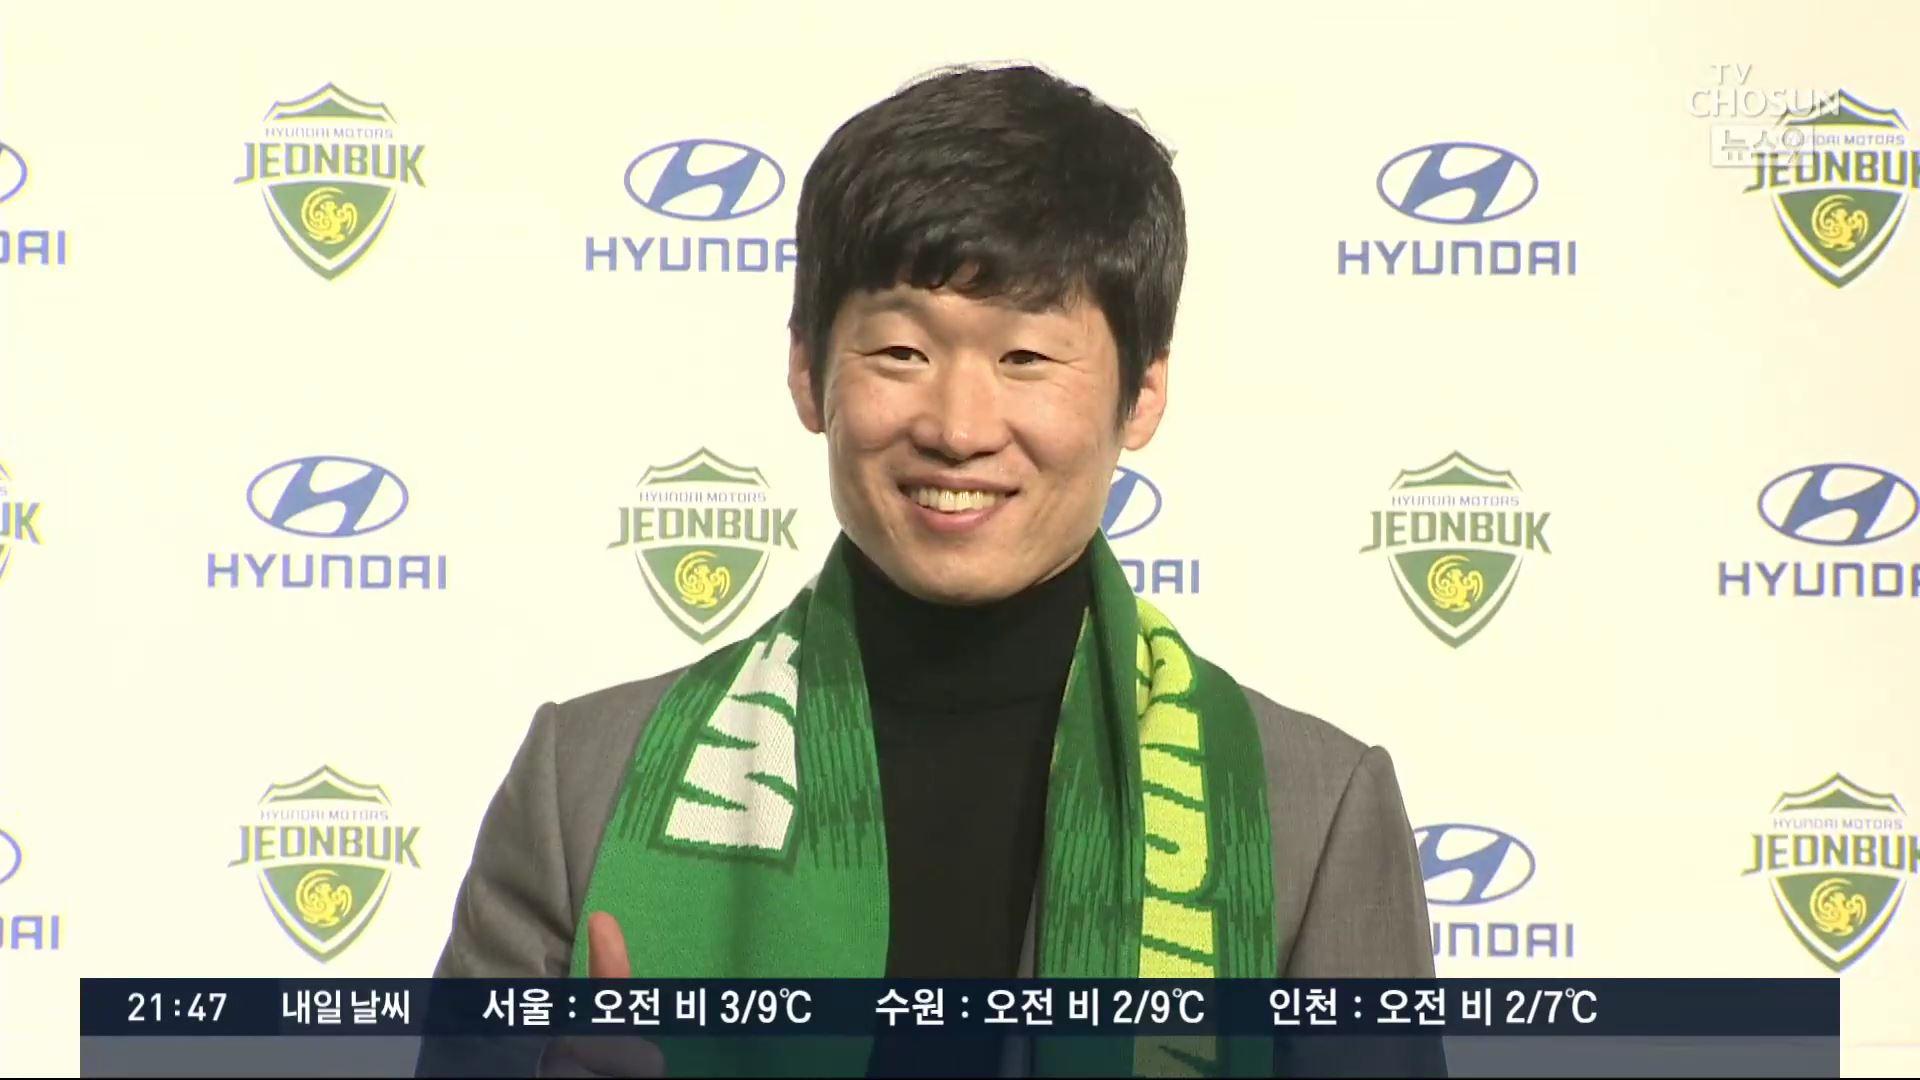 K리그 입성 '캡틴' 박지성…'전북을 최고의 산실로'